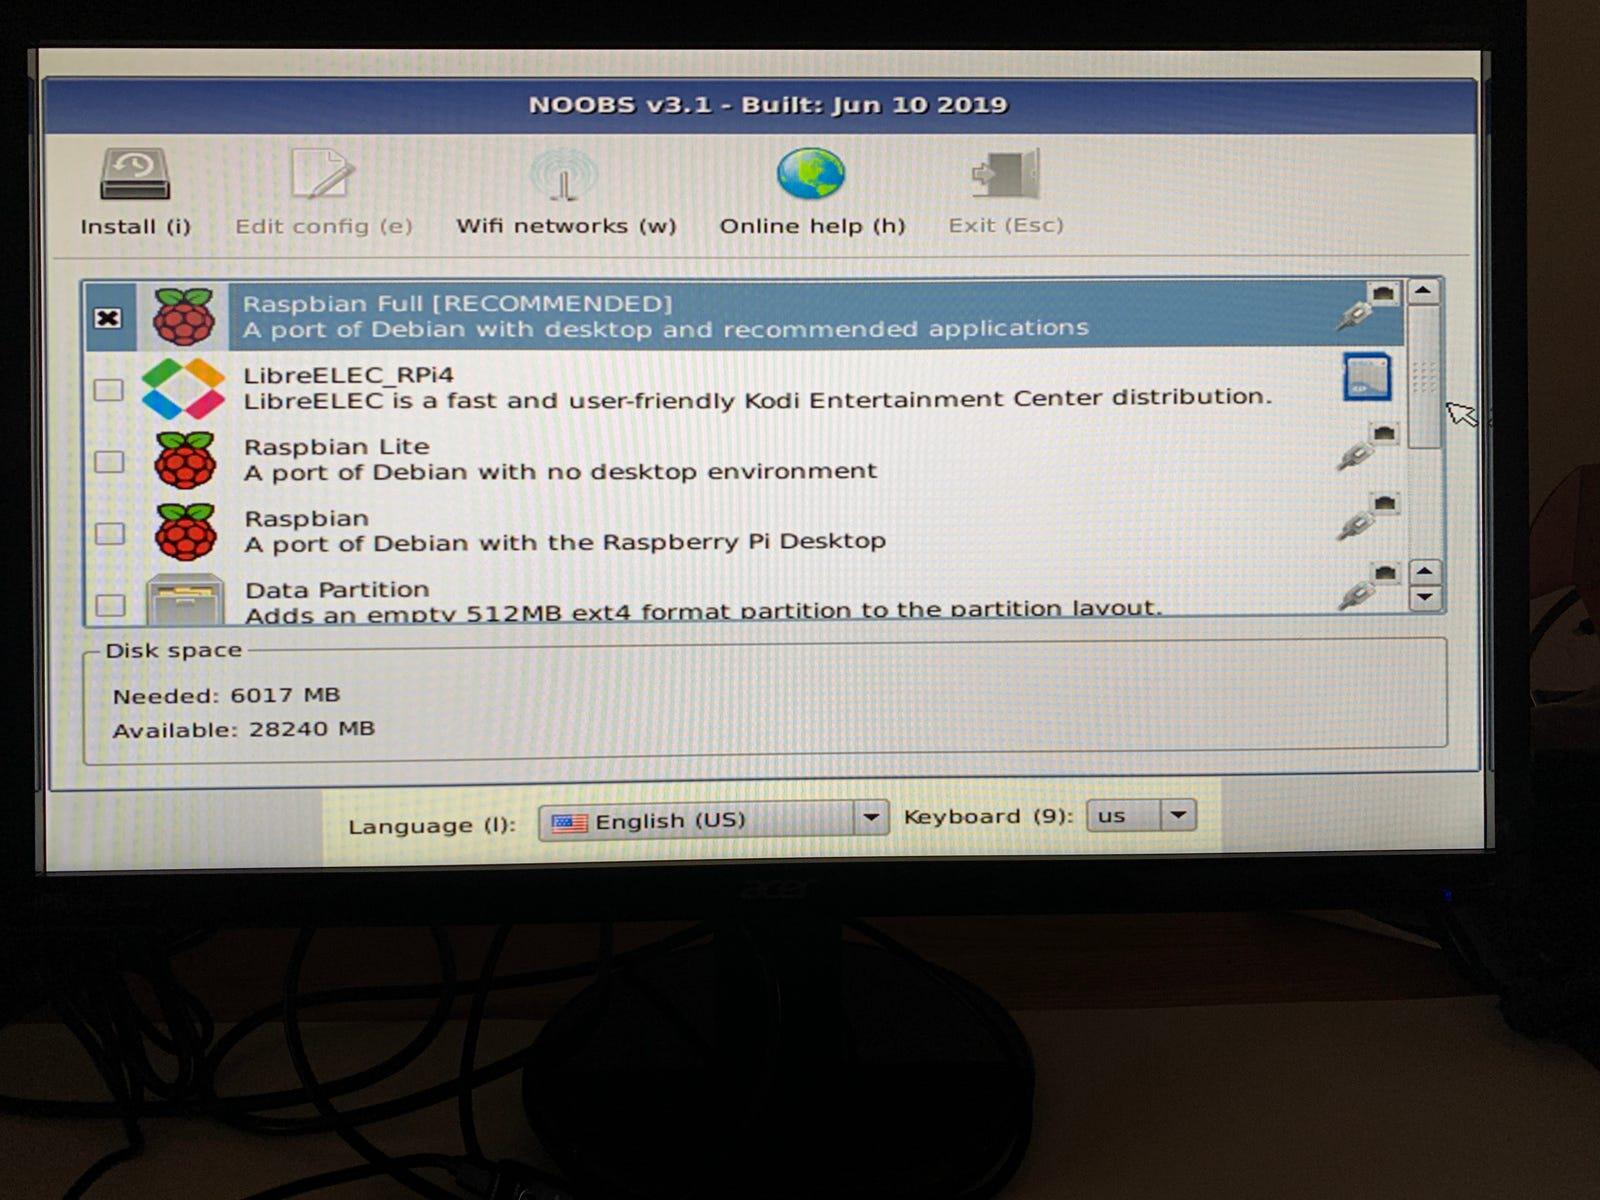 The NOOBS v3.1 installation menu on Raspberry Pi.